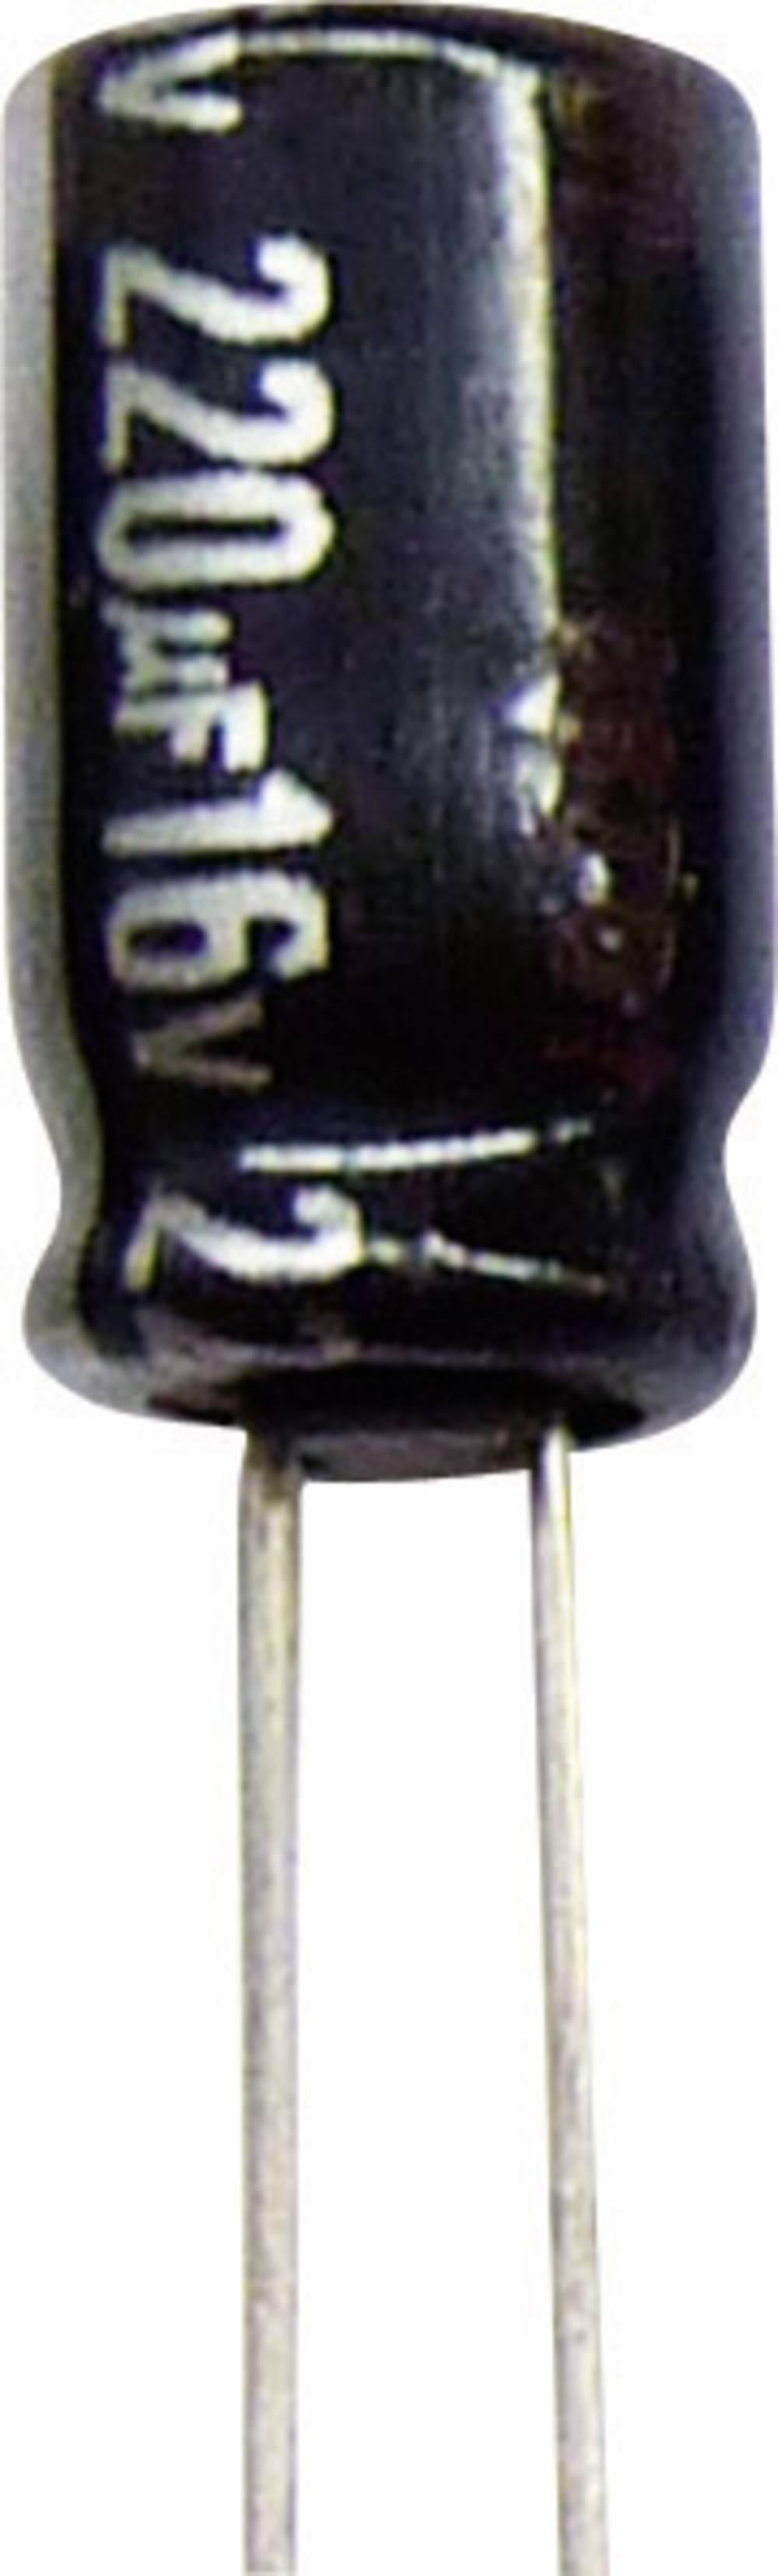 Panasonic Radijalni kondenzator NHG ECA1CHG101I (OxV) 5 mm x11 mm raster 2.5 mm 100F 16 V